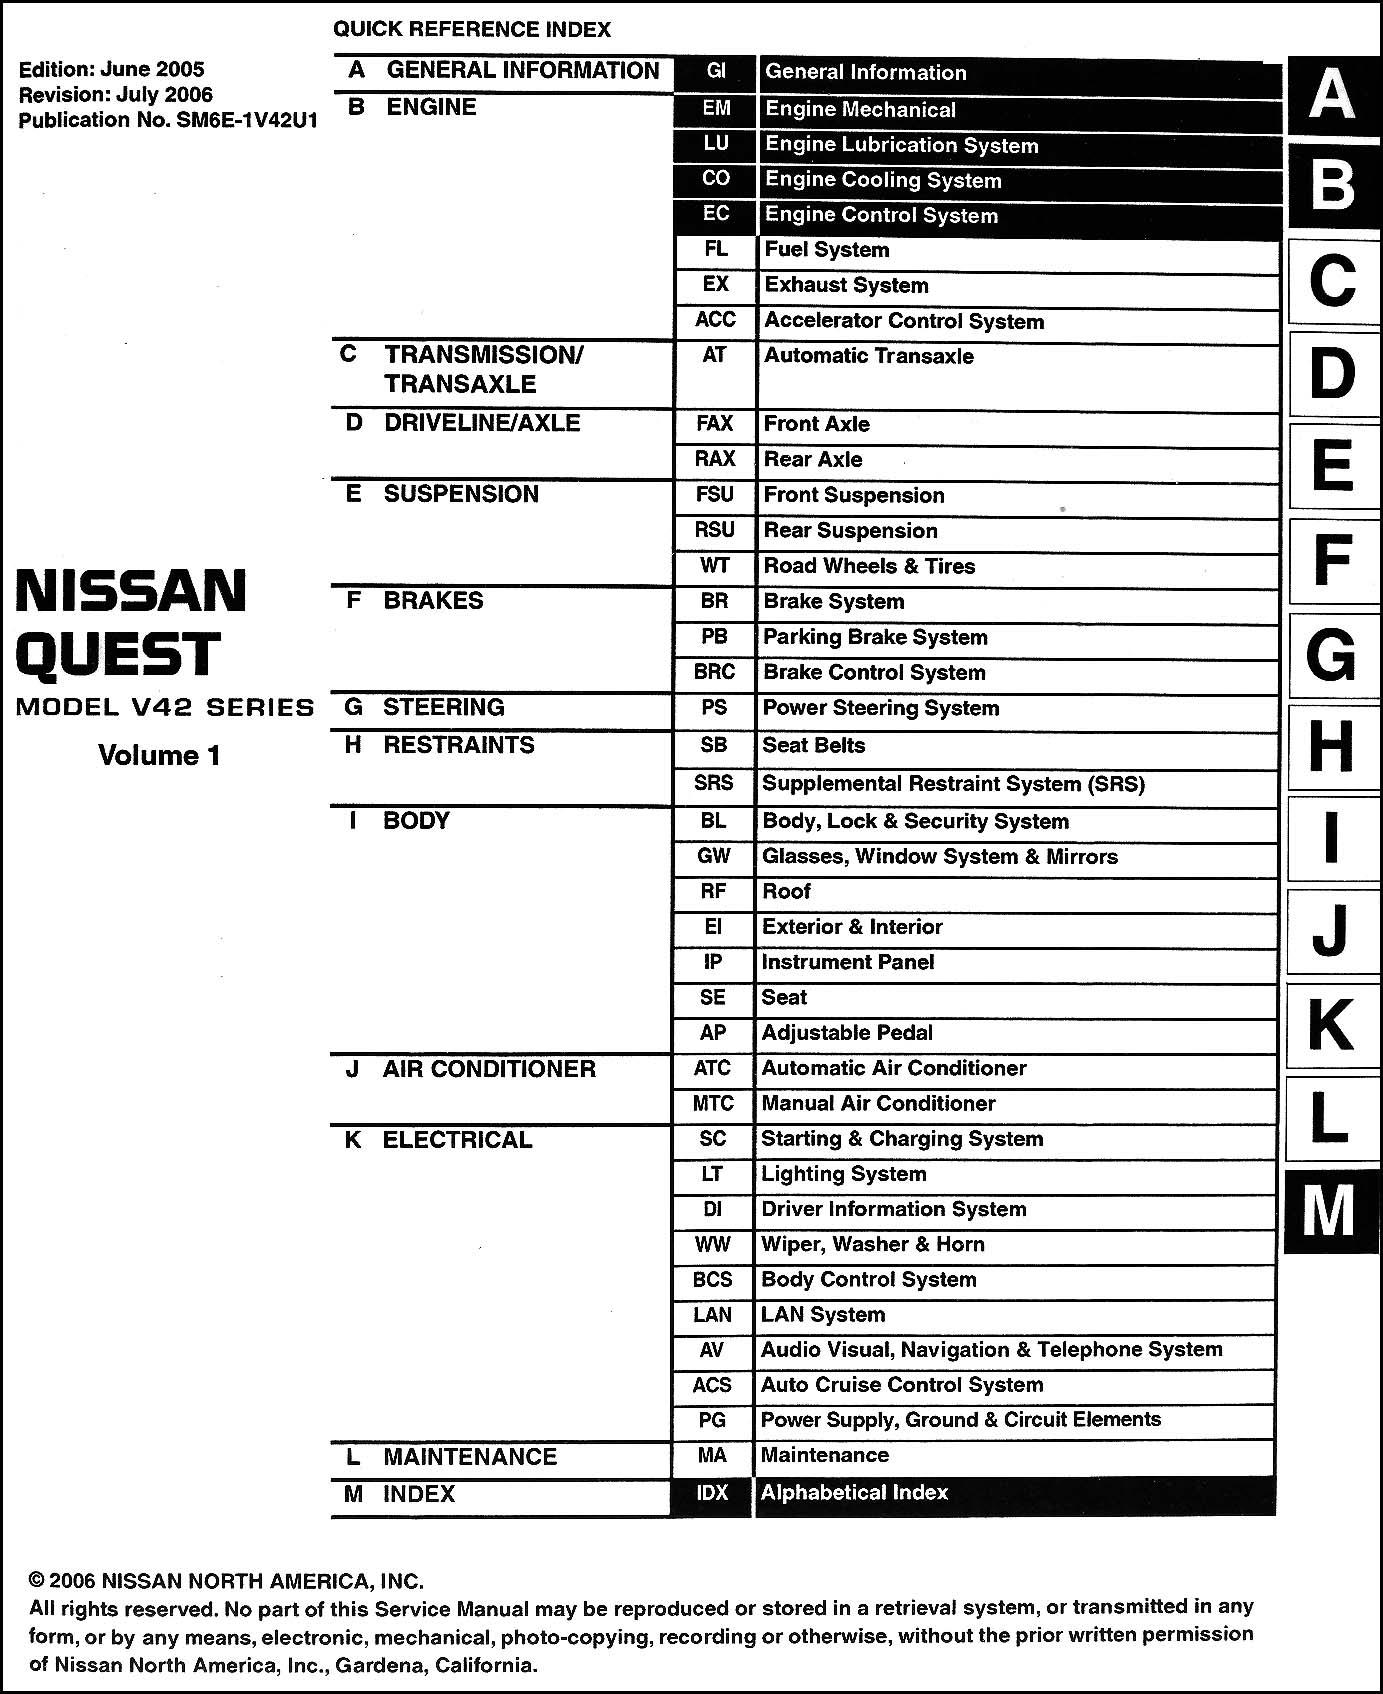 1994 nissan quest radio wiring diagram